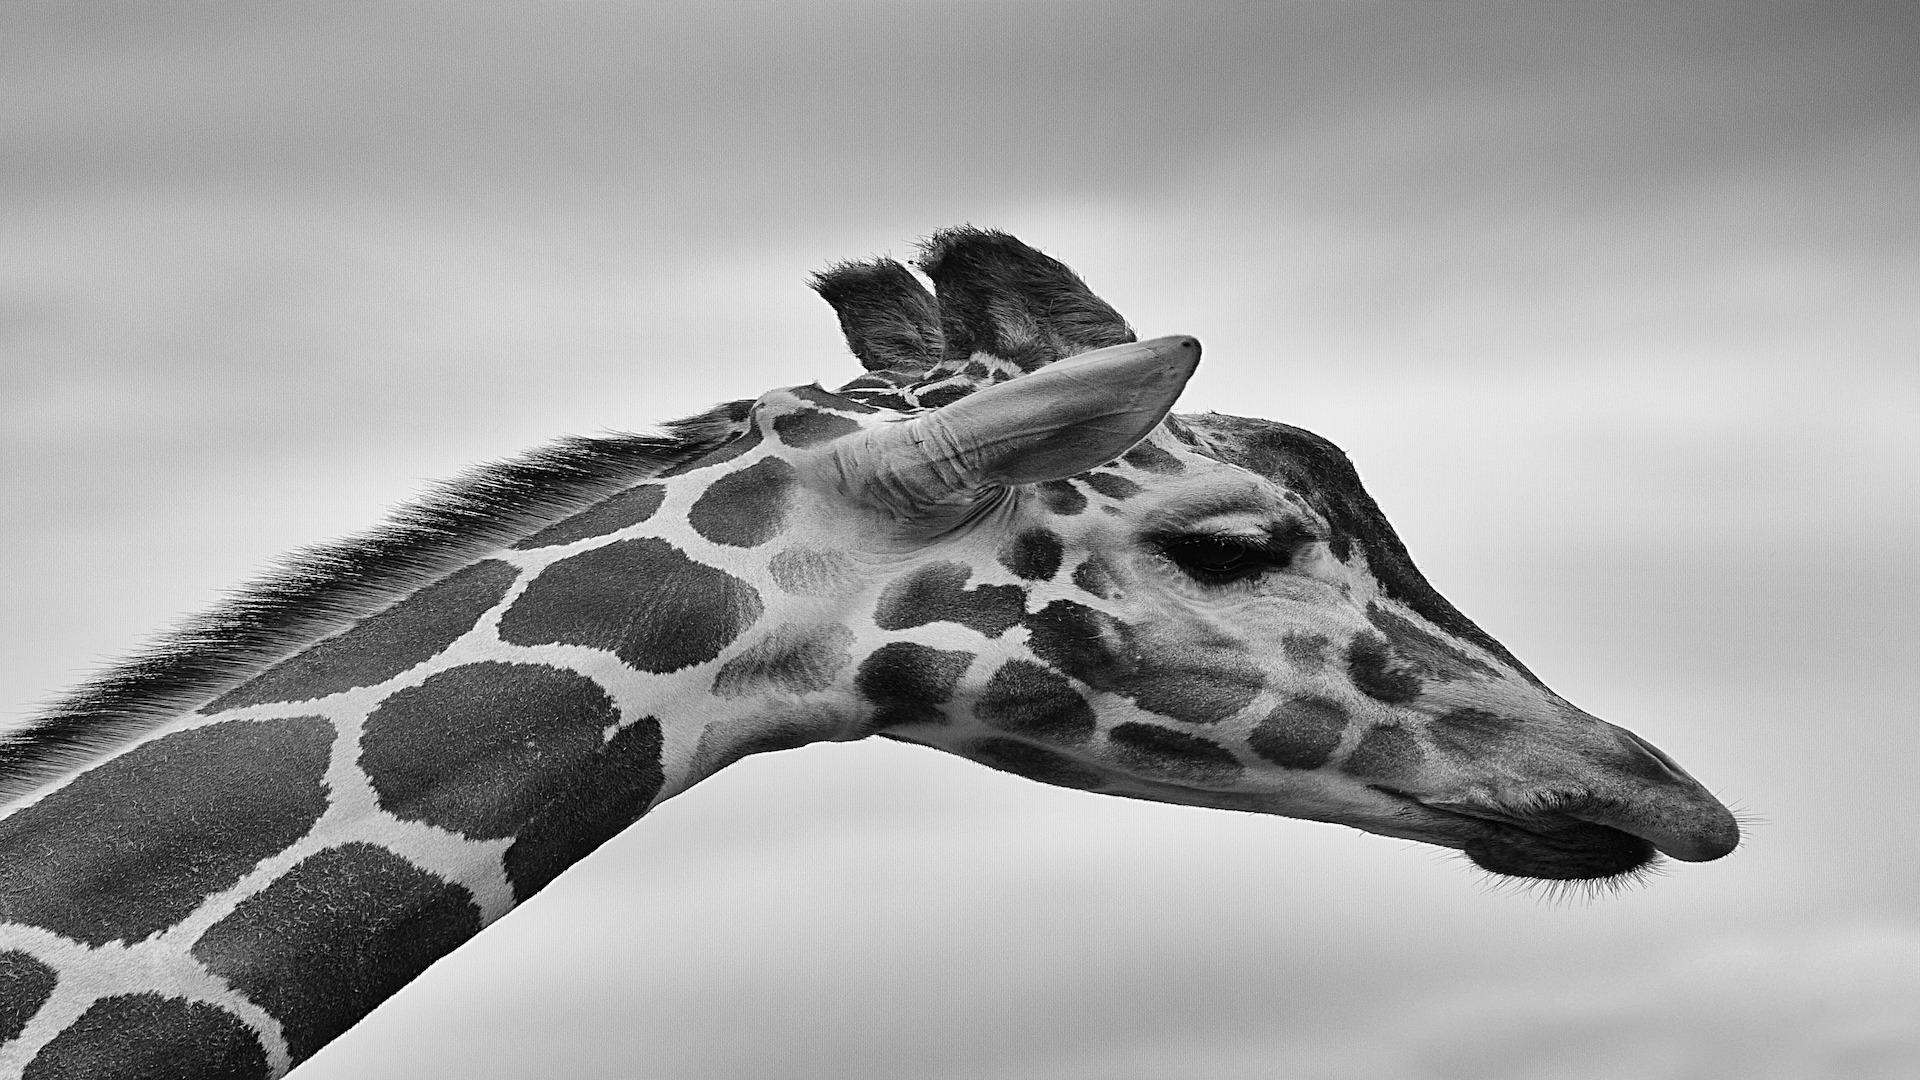 giraffe-801905_1920